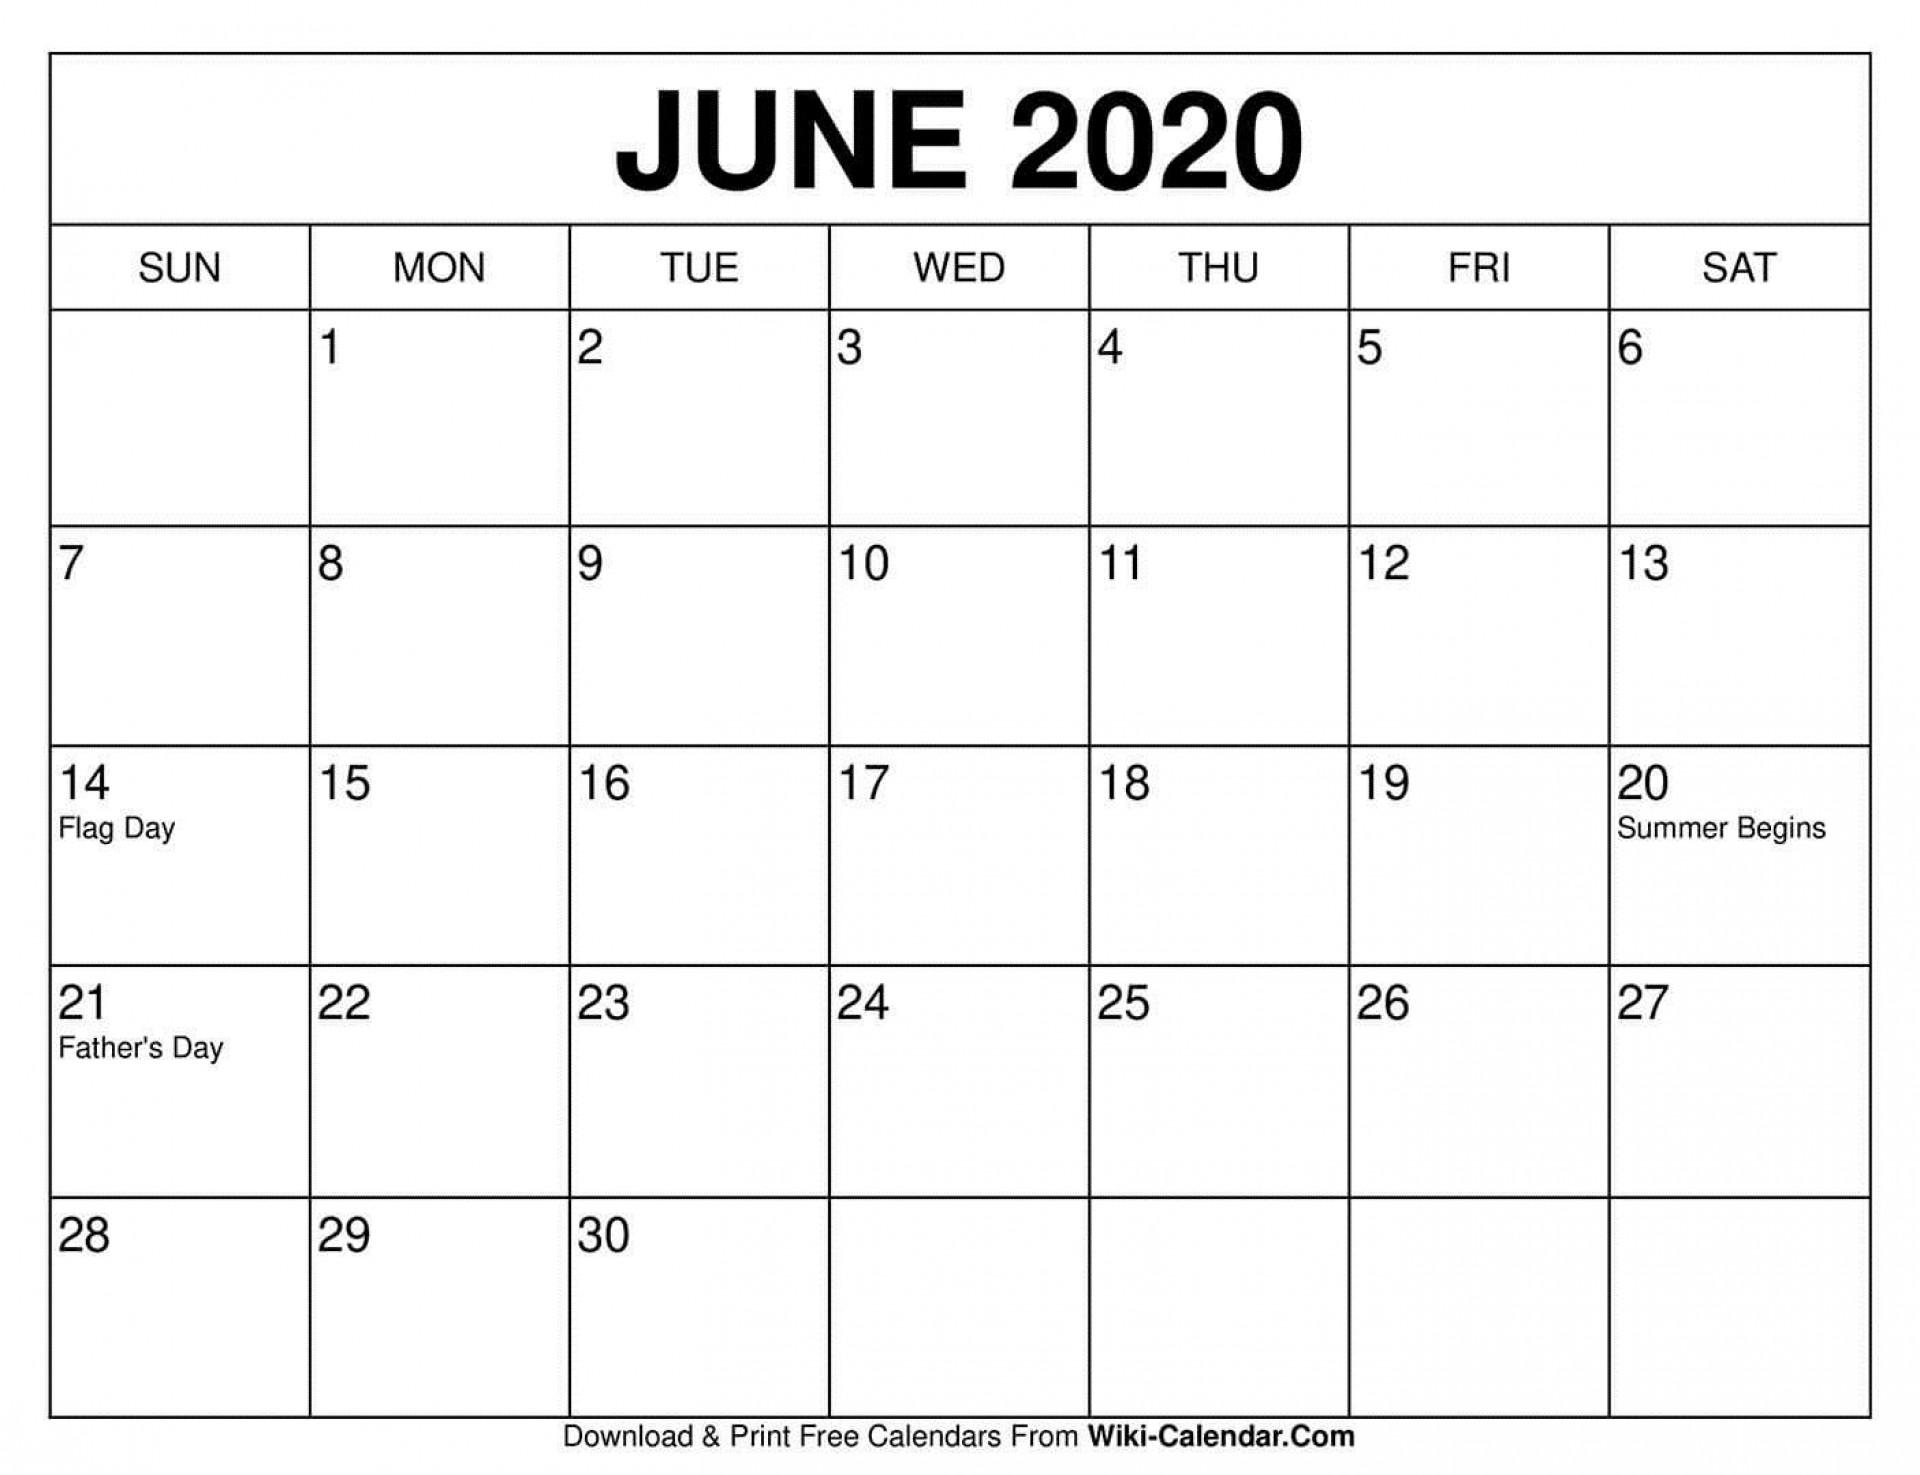 007 Shocking June 2020 Monthly Calendar Template Highest Clarity 1920